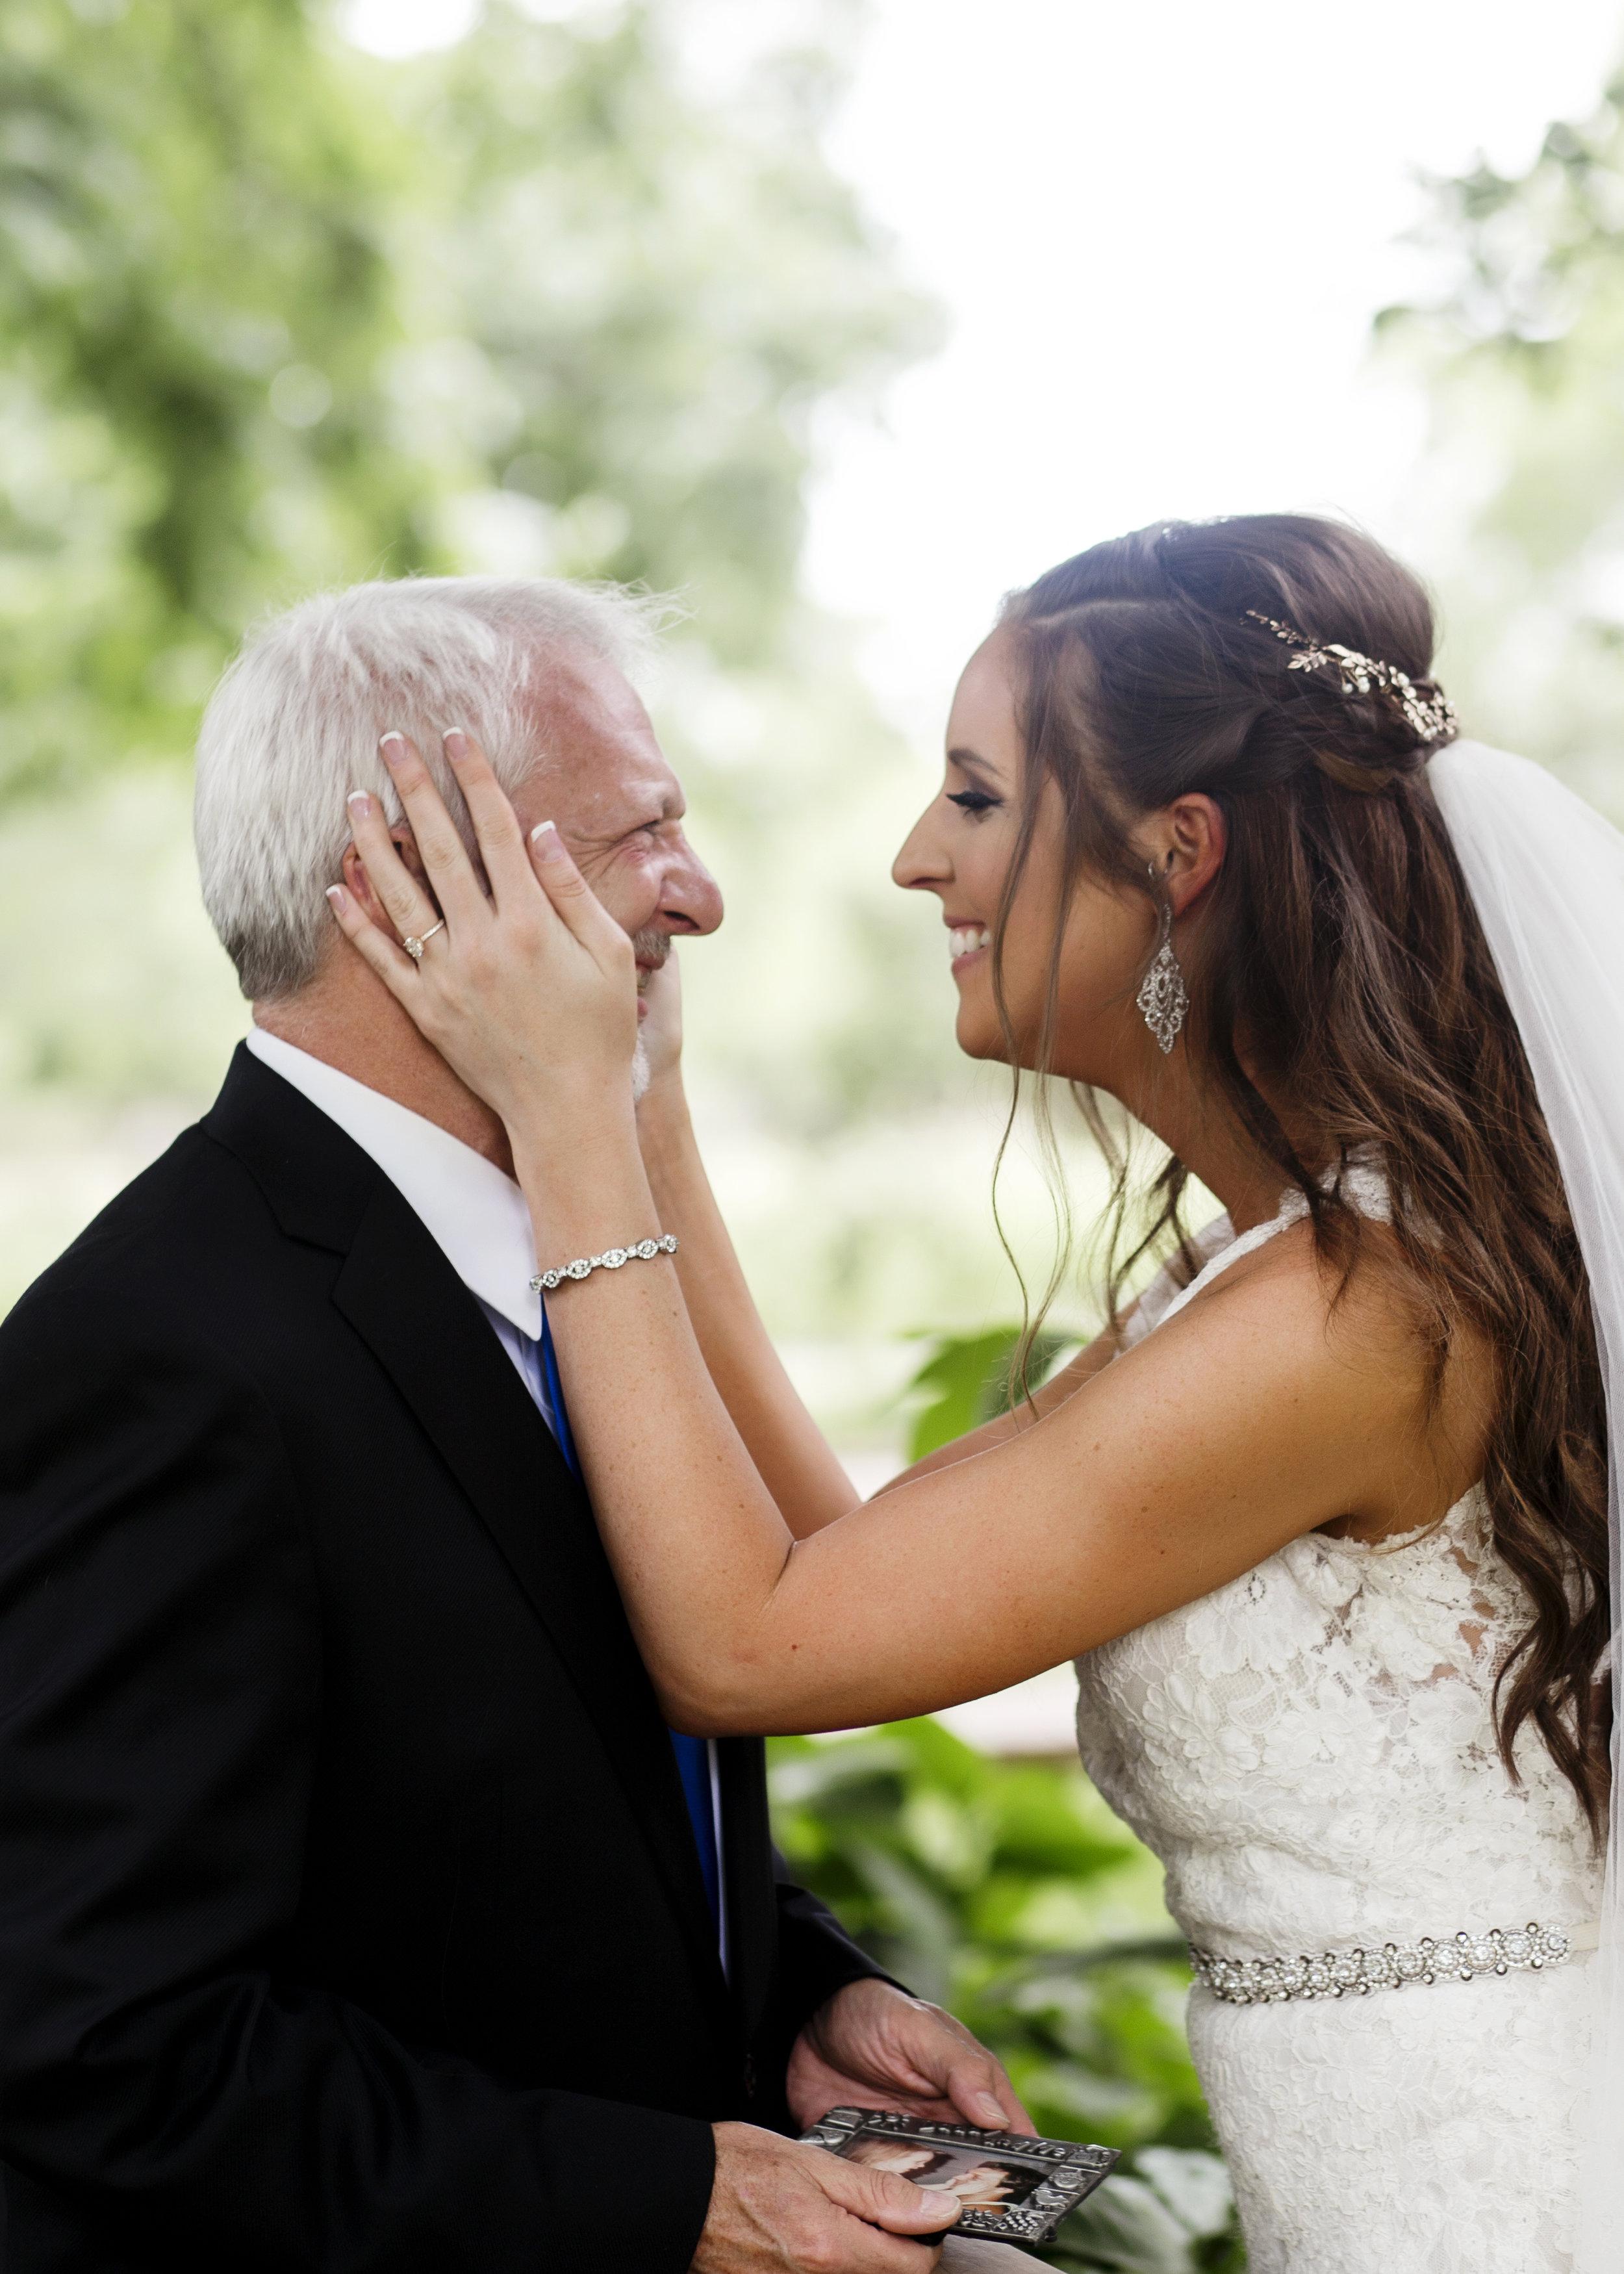 Calvin-wedding-chandelier-grove-tomball-tx-ashleigh-rodriguez-photography-107 copy.jpg